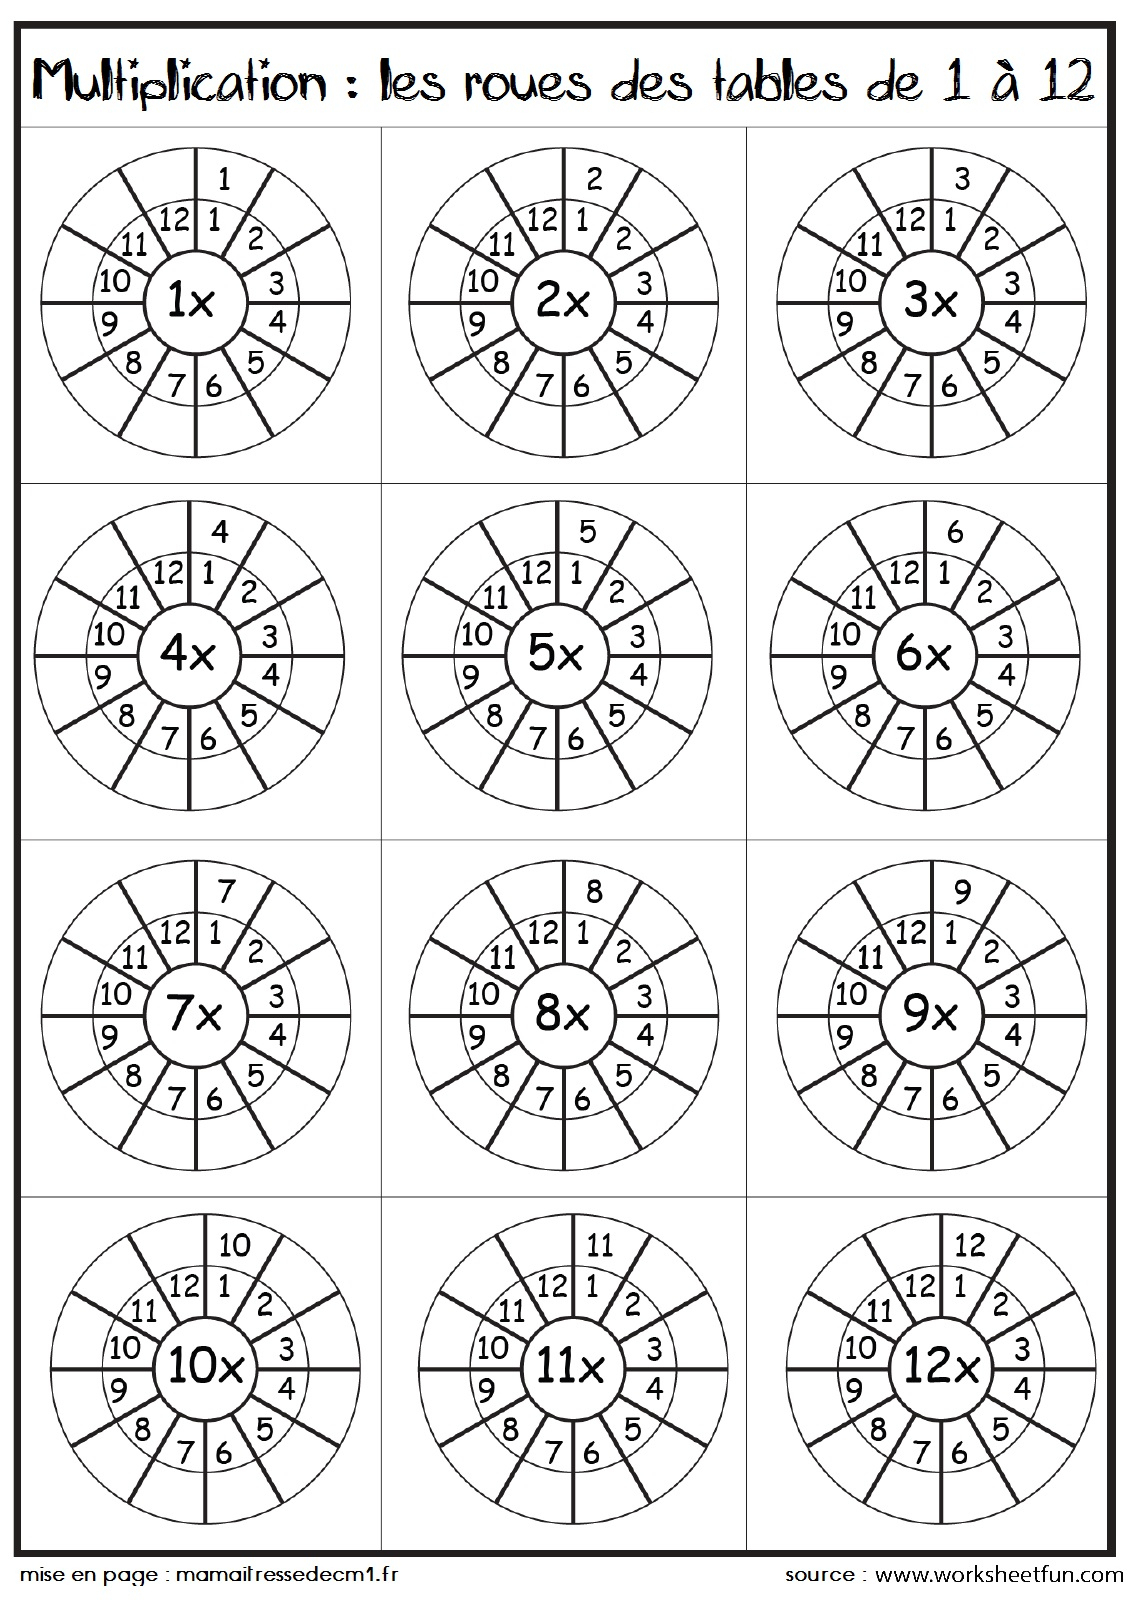 Tables De Multiplications | Ma Maitresse De Cm1-Cm2 dedans Tables De Multiplication Jeux À Imprimer